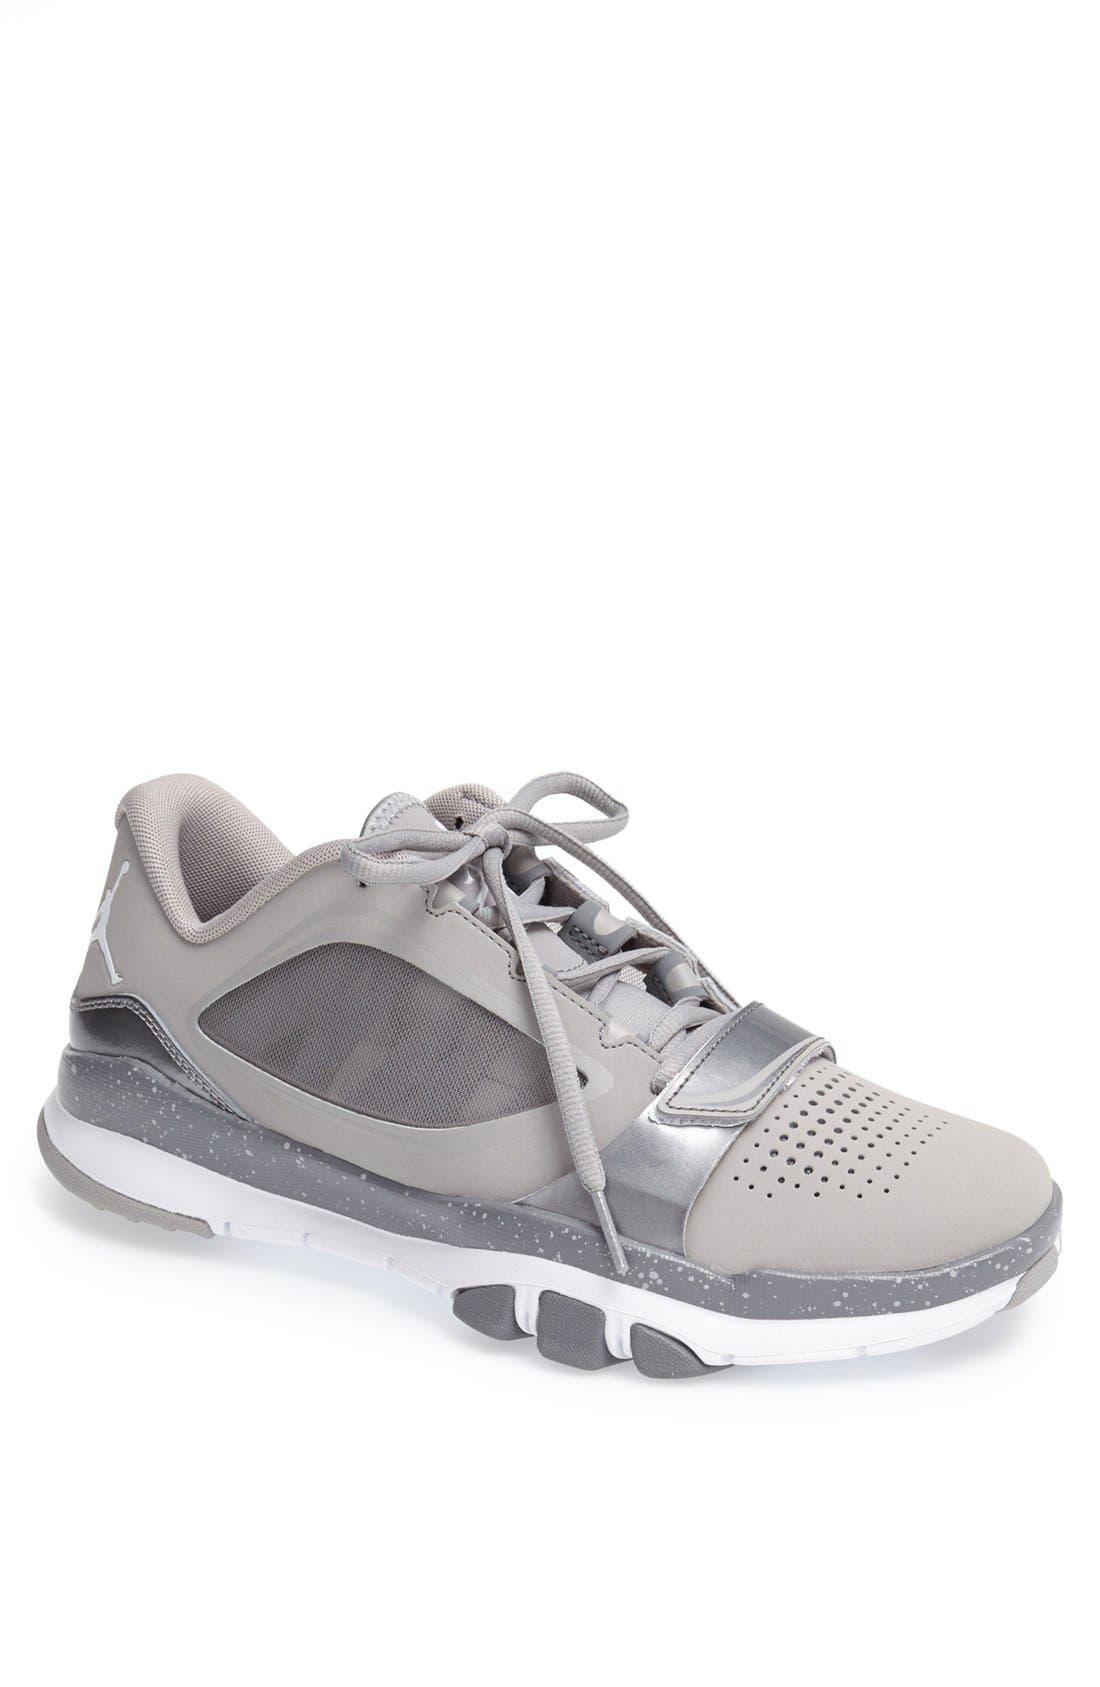 Main Image - Nike 'Jordan Trunner Dominate FLX' Training Shoe (Men)